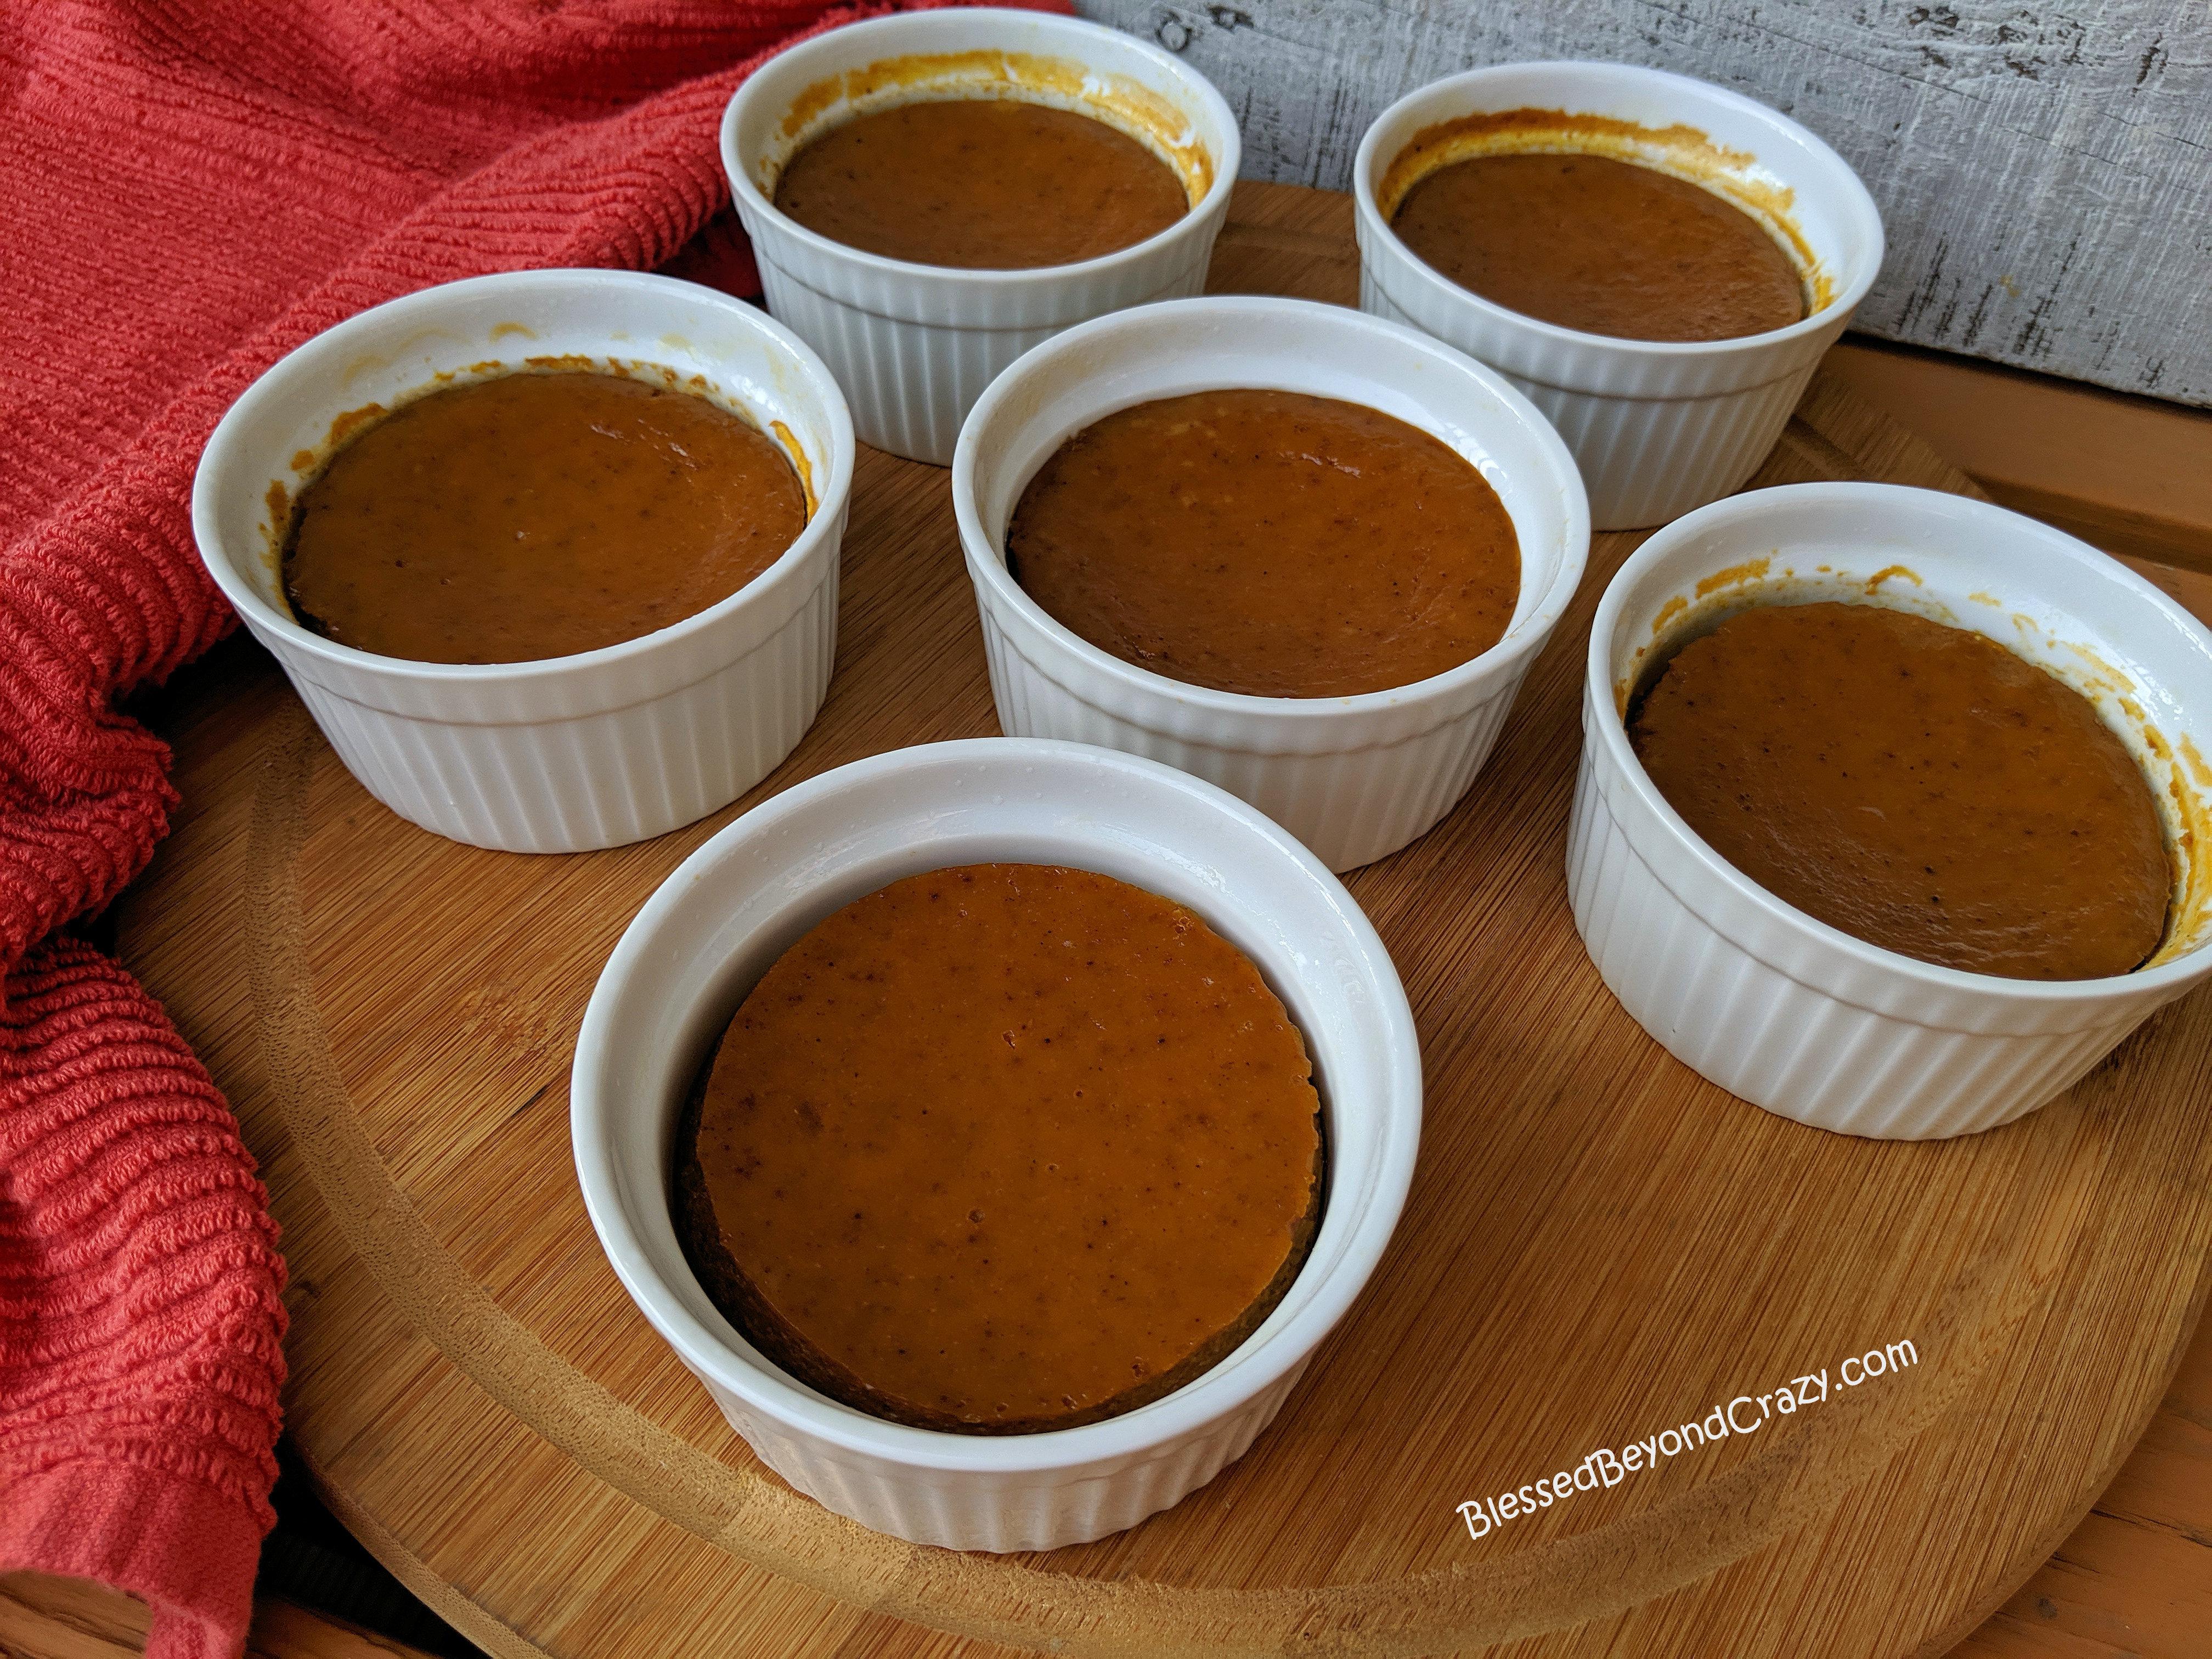 Six Mini Lite Maple Pumpkin Crustless Pies ready to enjoy!